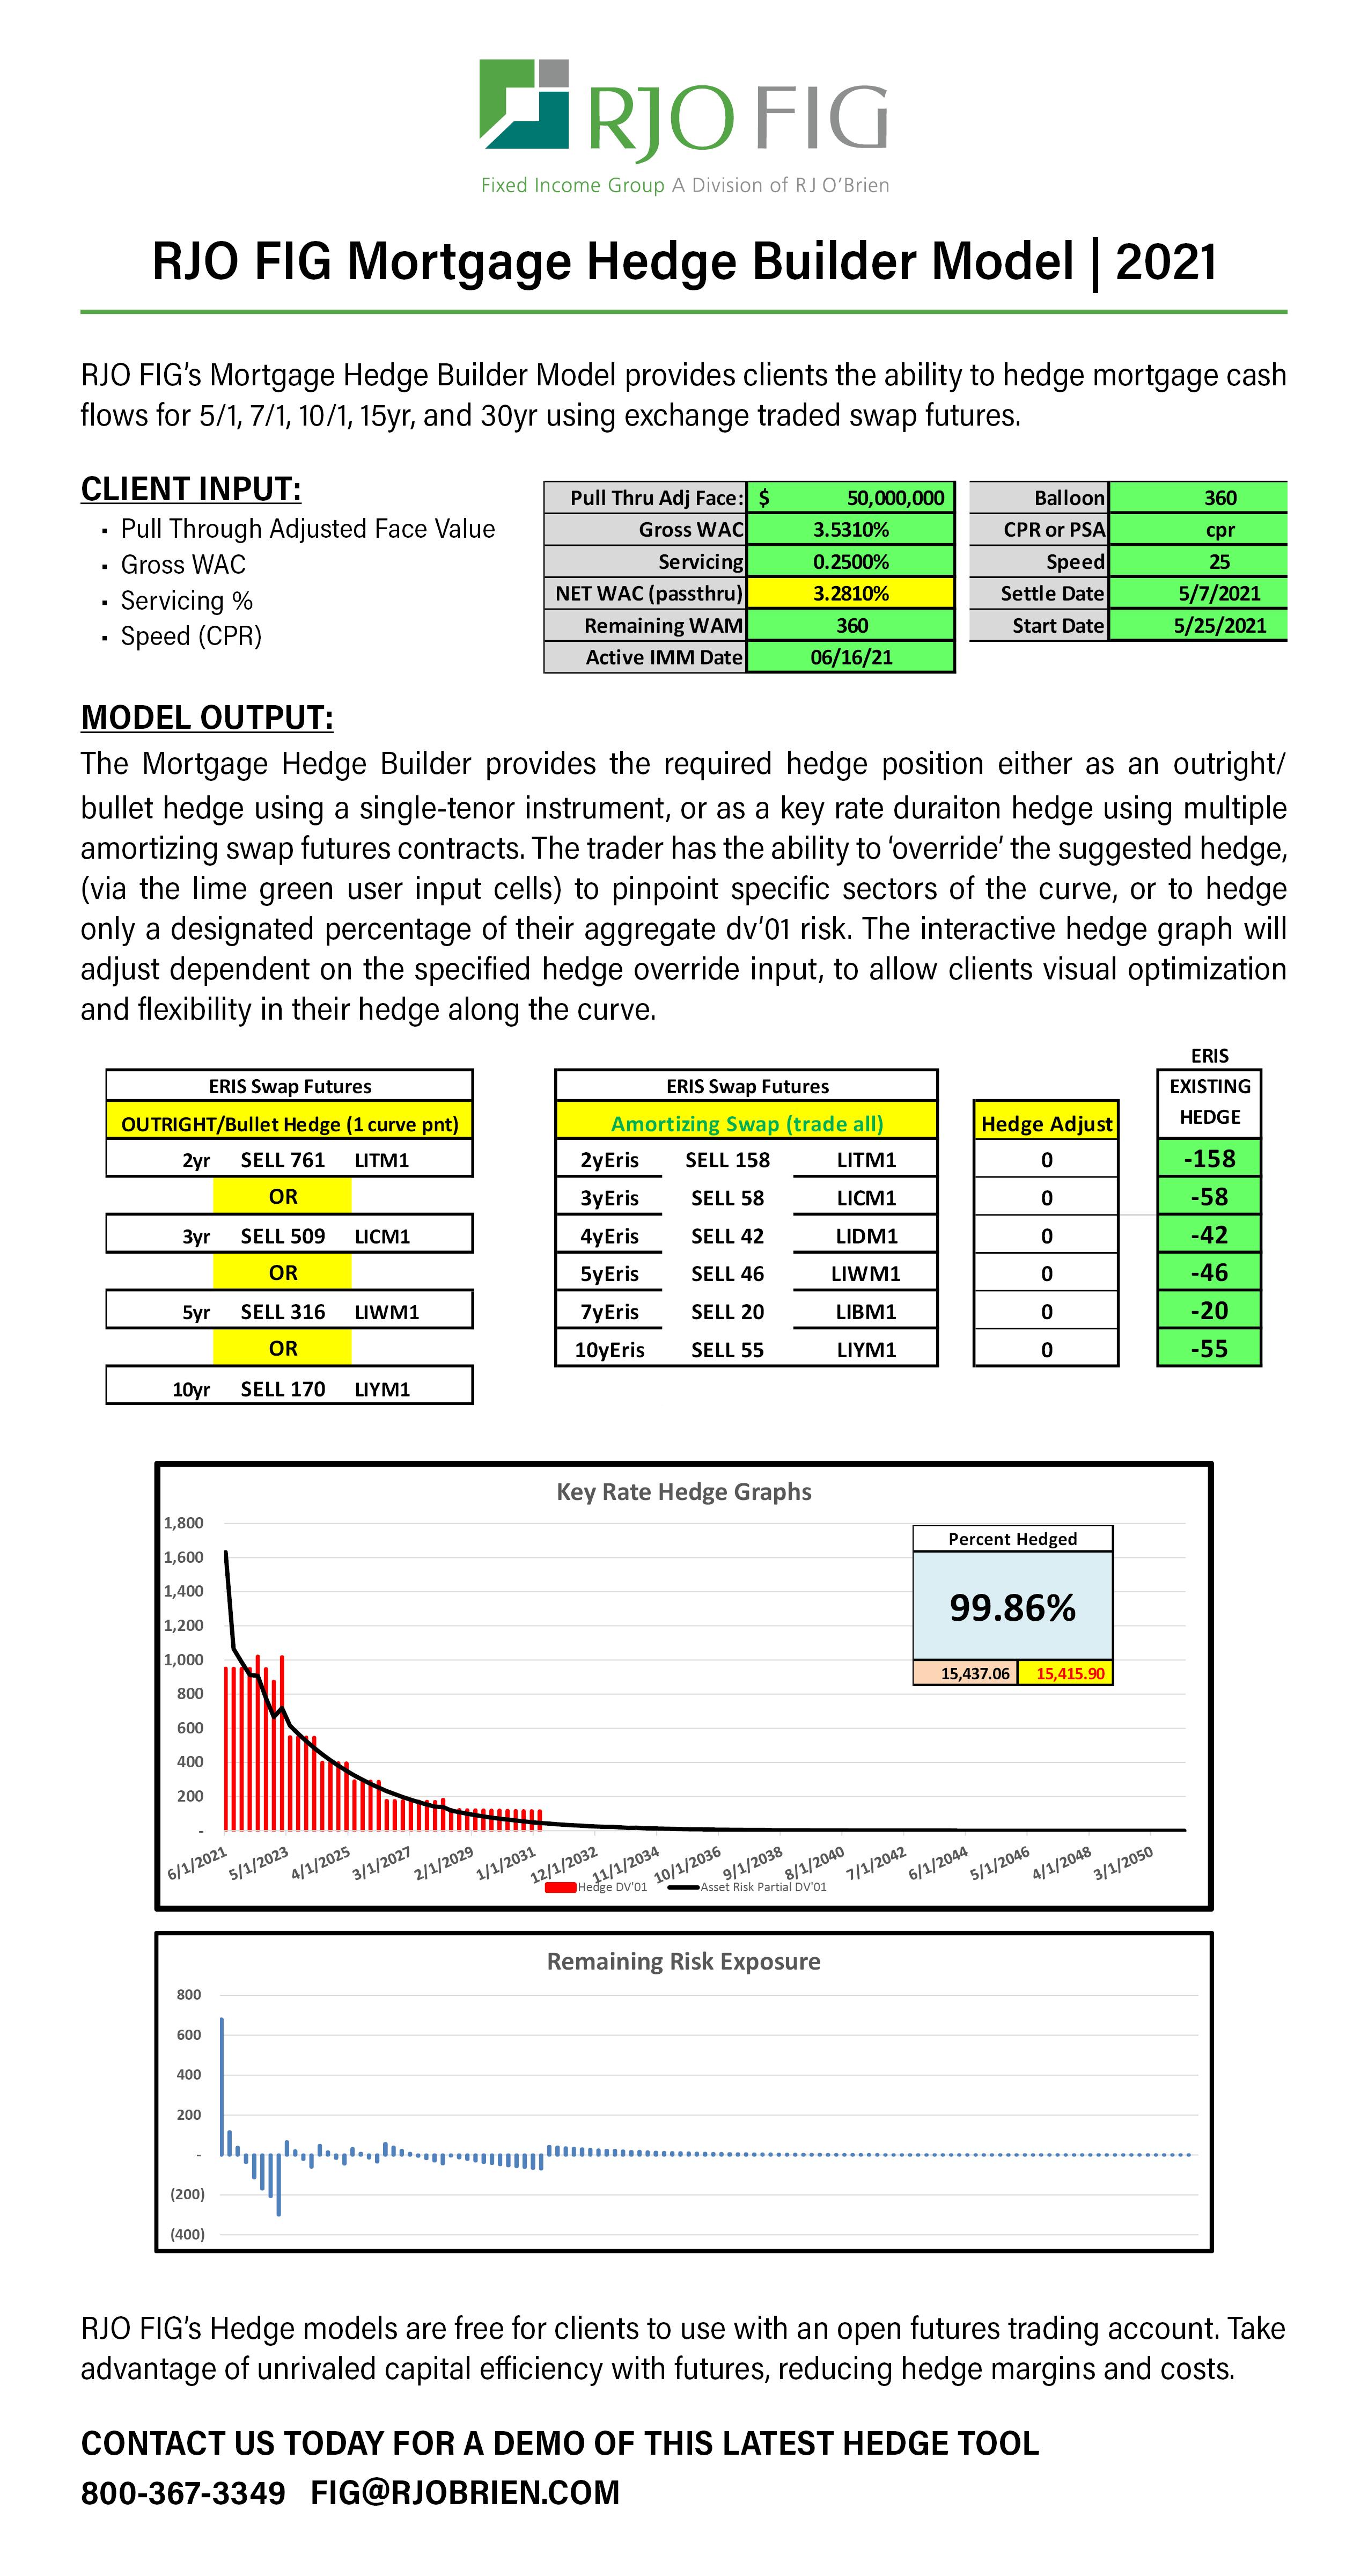 HedgeBuilder Graphic